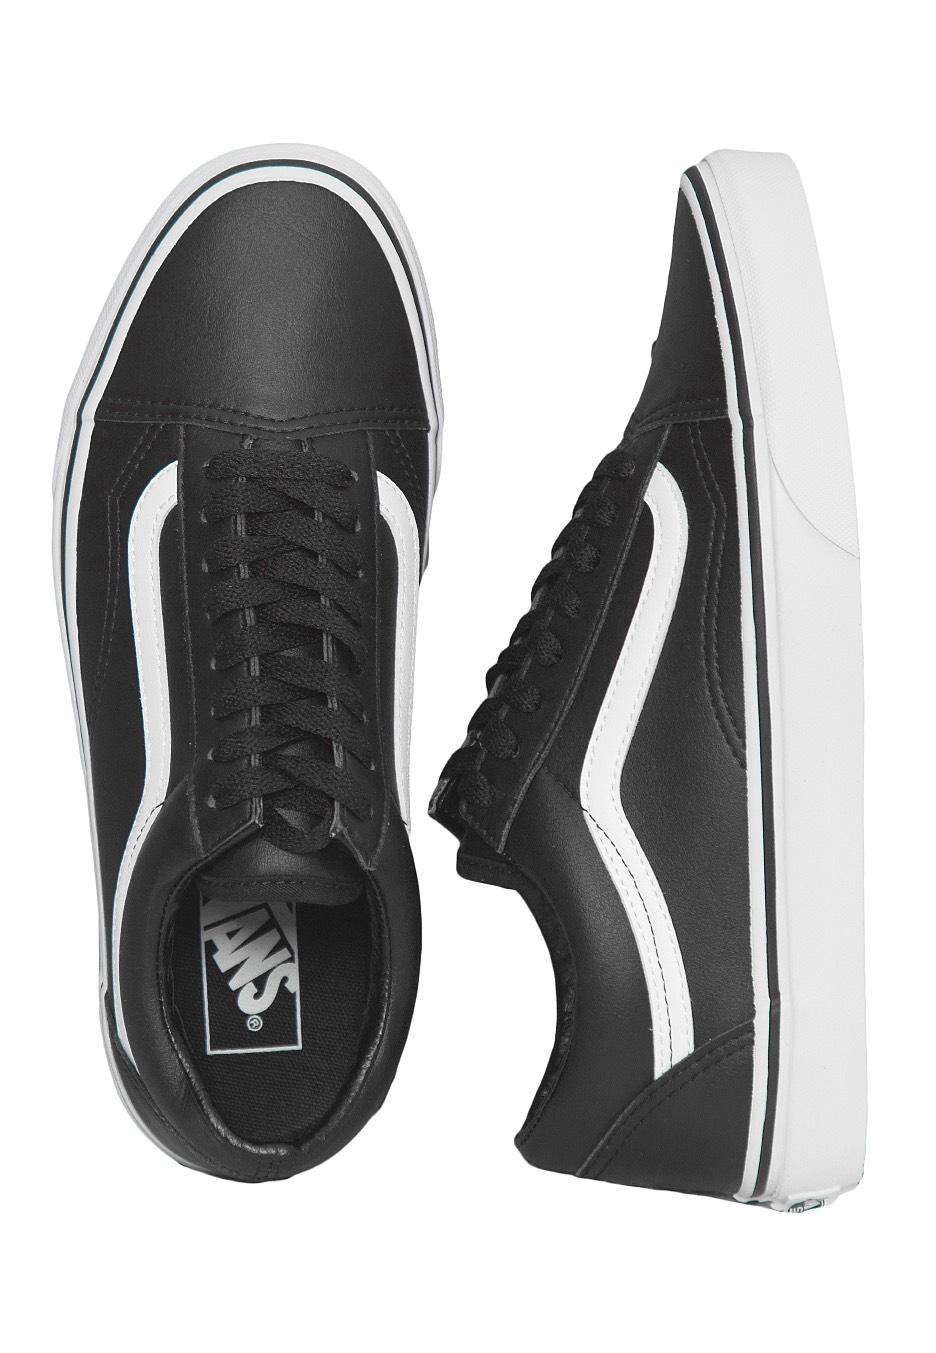 e4c68df6264 Vans - Old Skool Classic Tumble Black/True White - Shoes - Impericon.com US